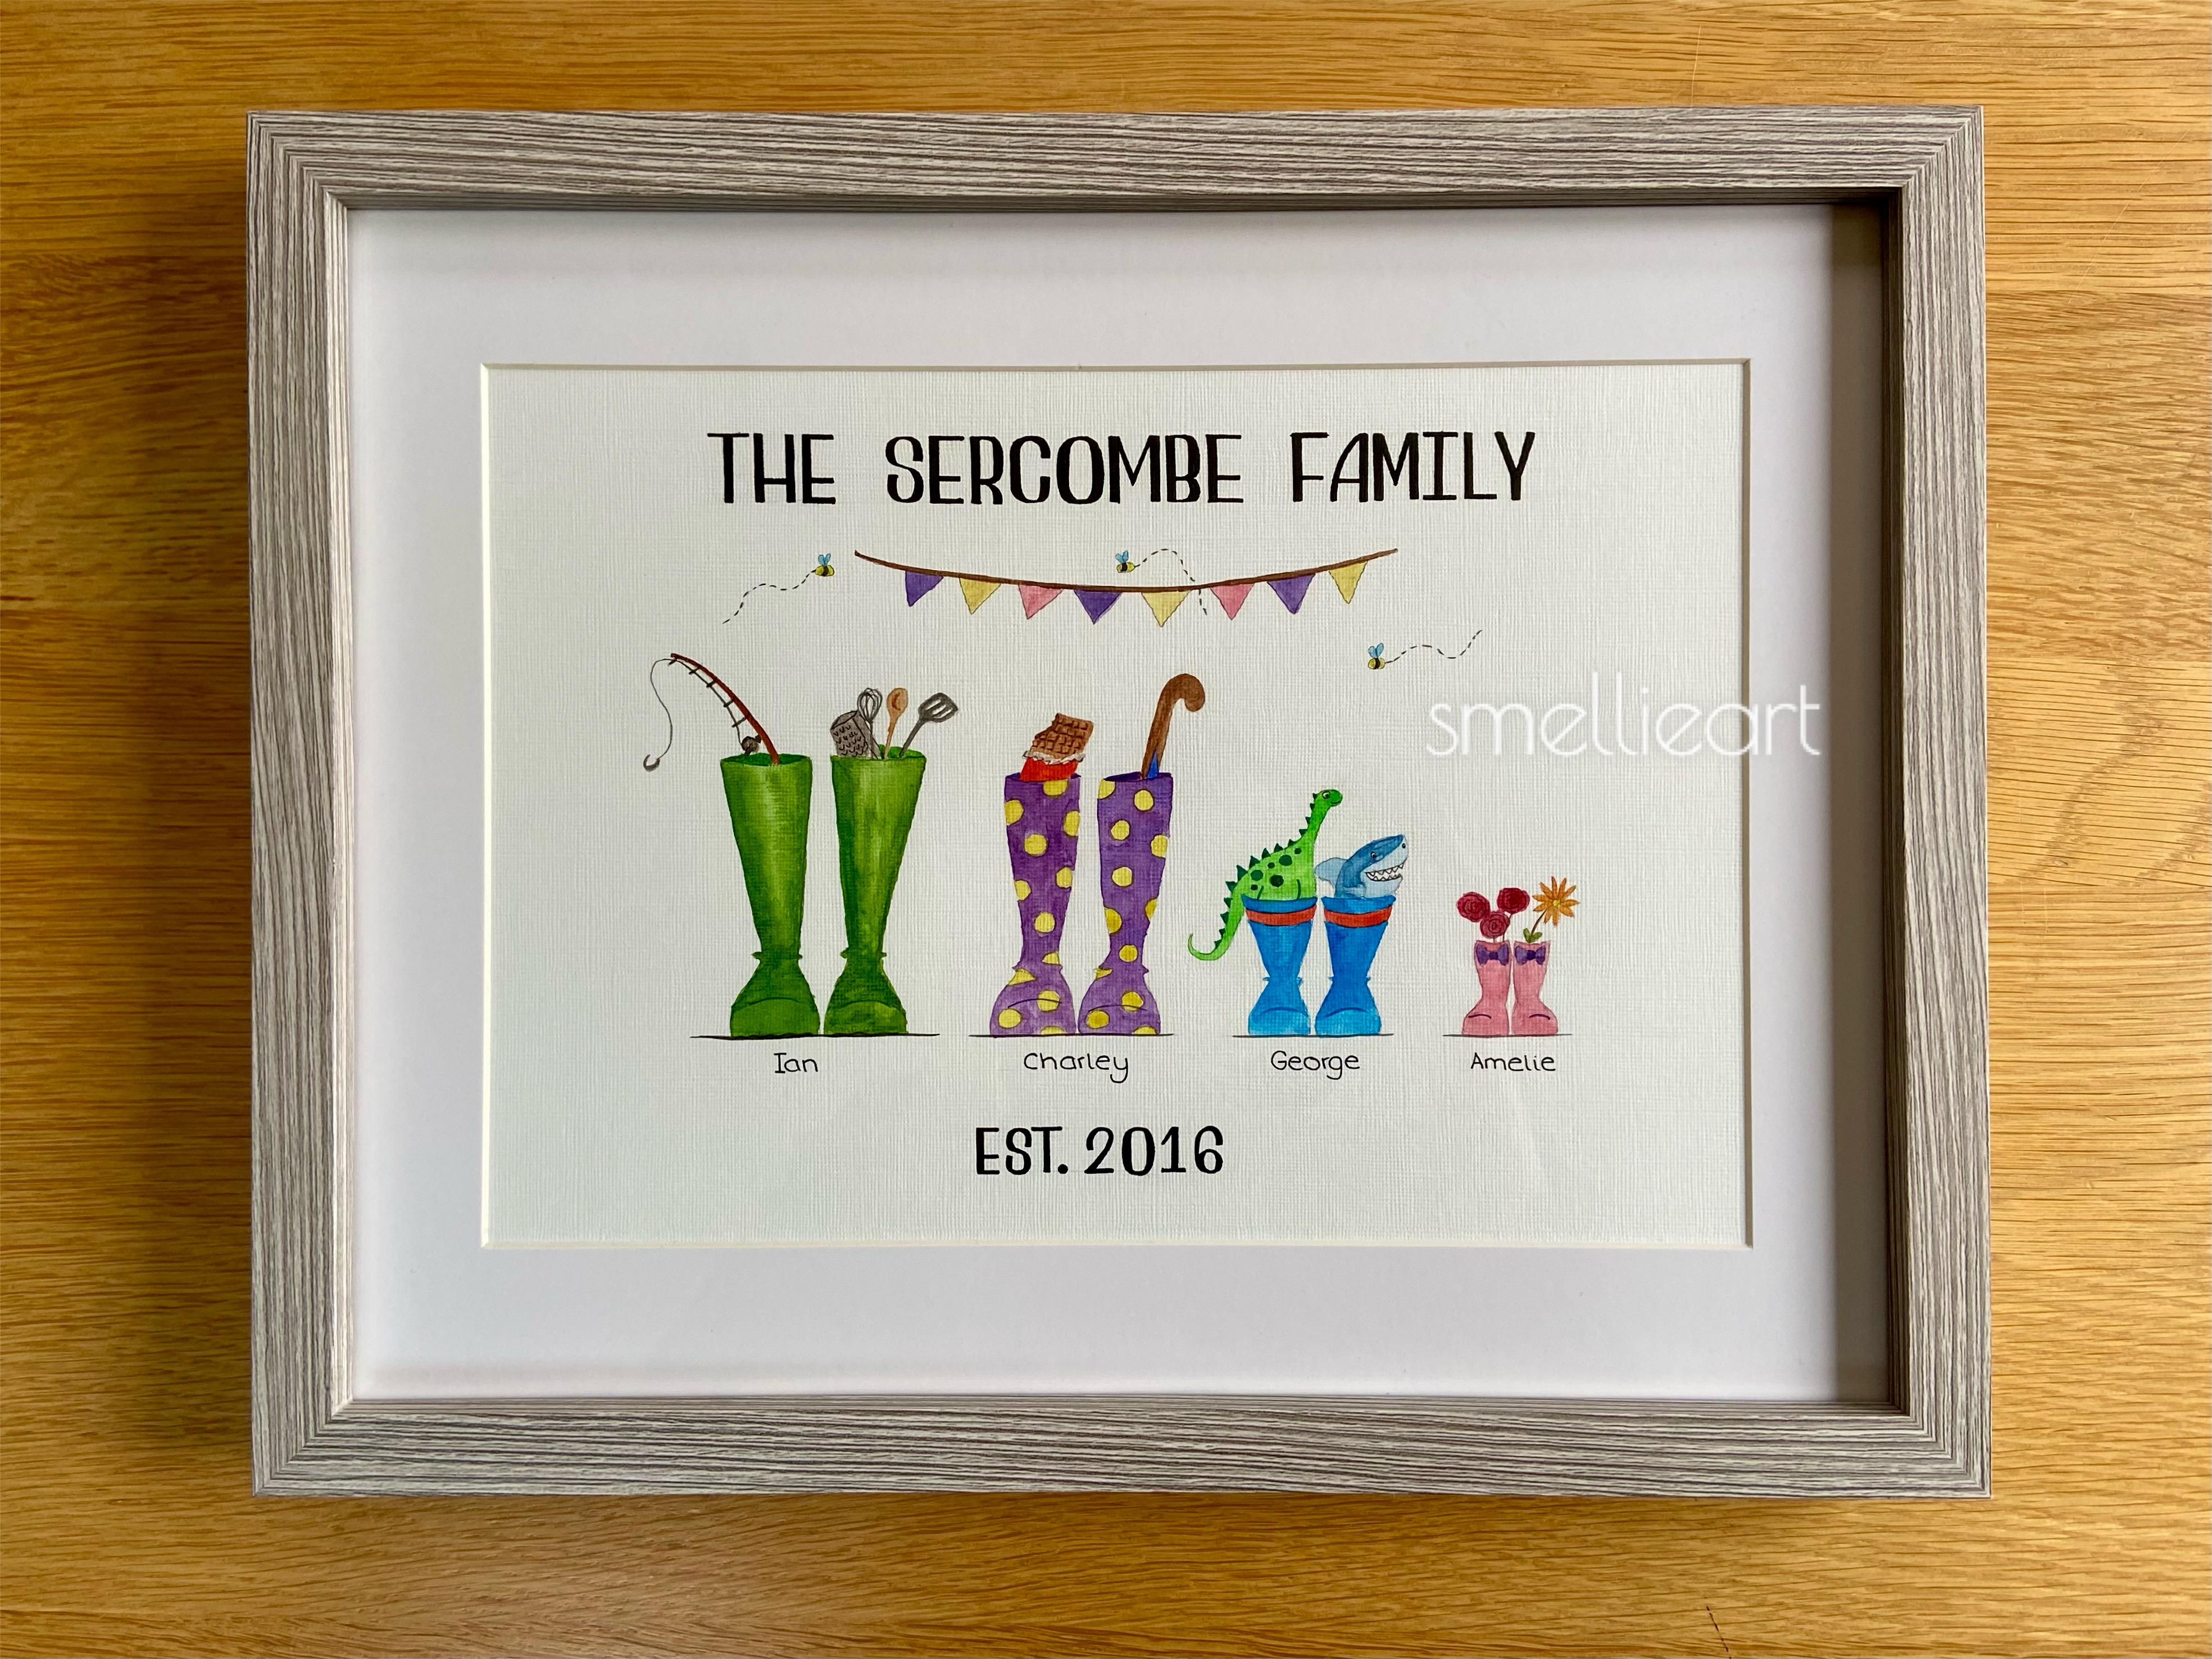 Sercombe Wellies (SmellieArt)